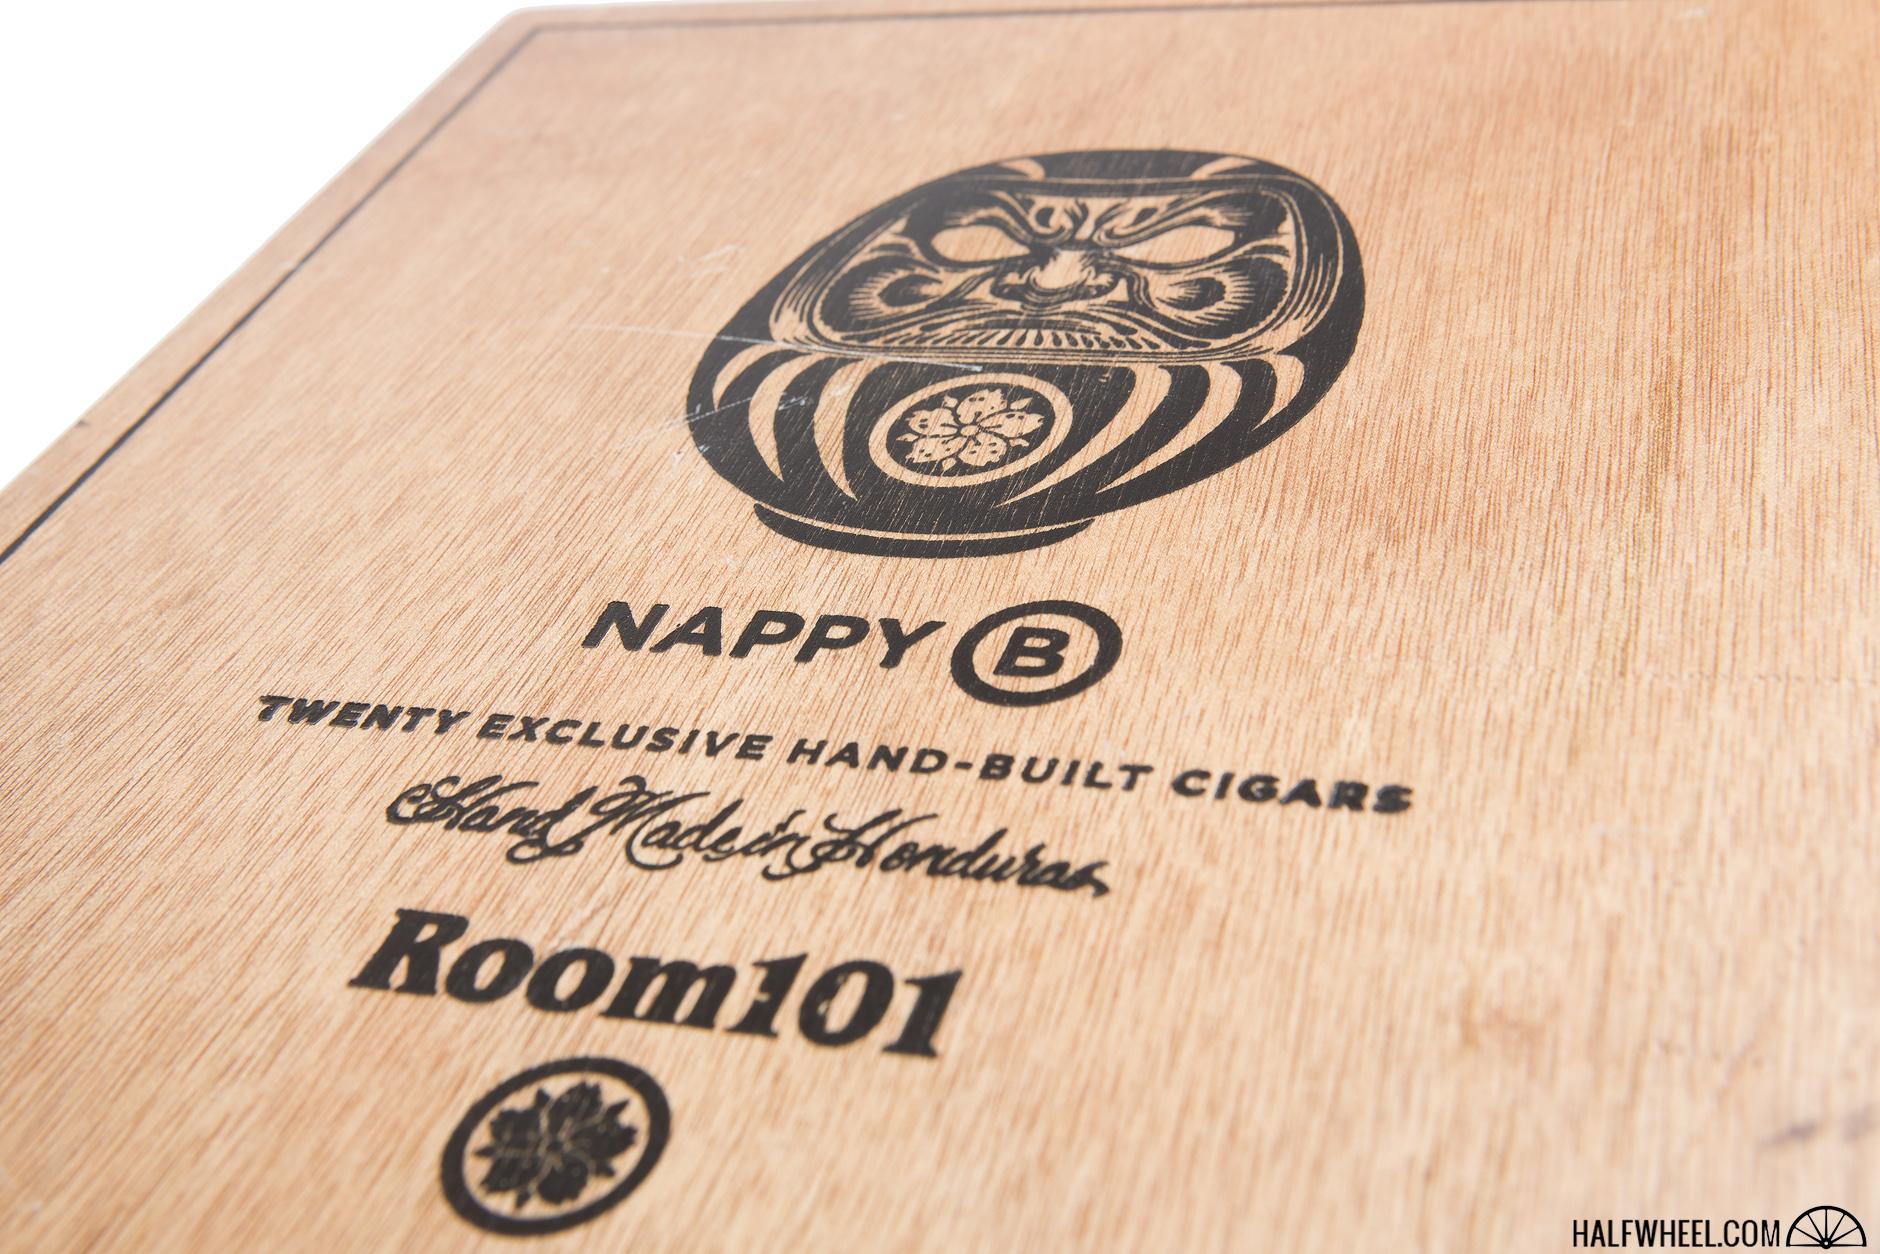 Room101 Daruma Nappy B Torpedo Box 2